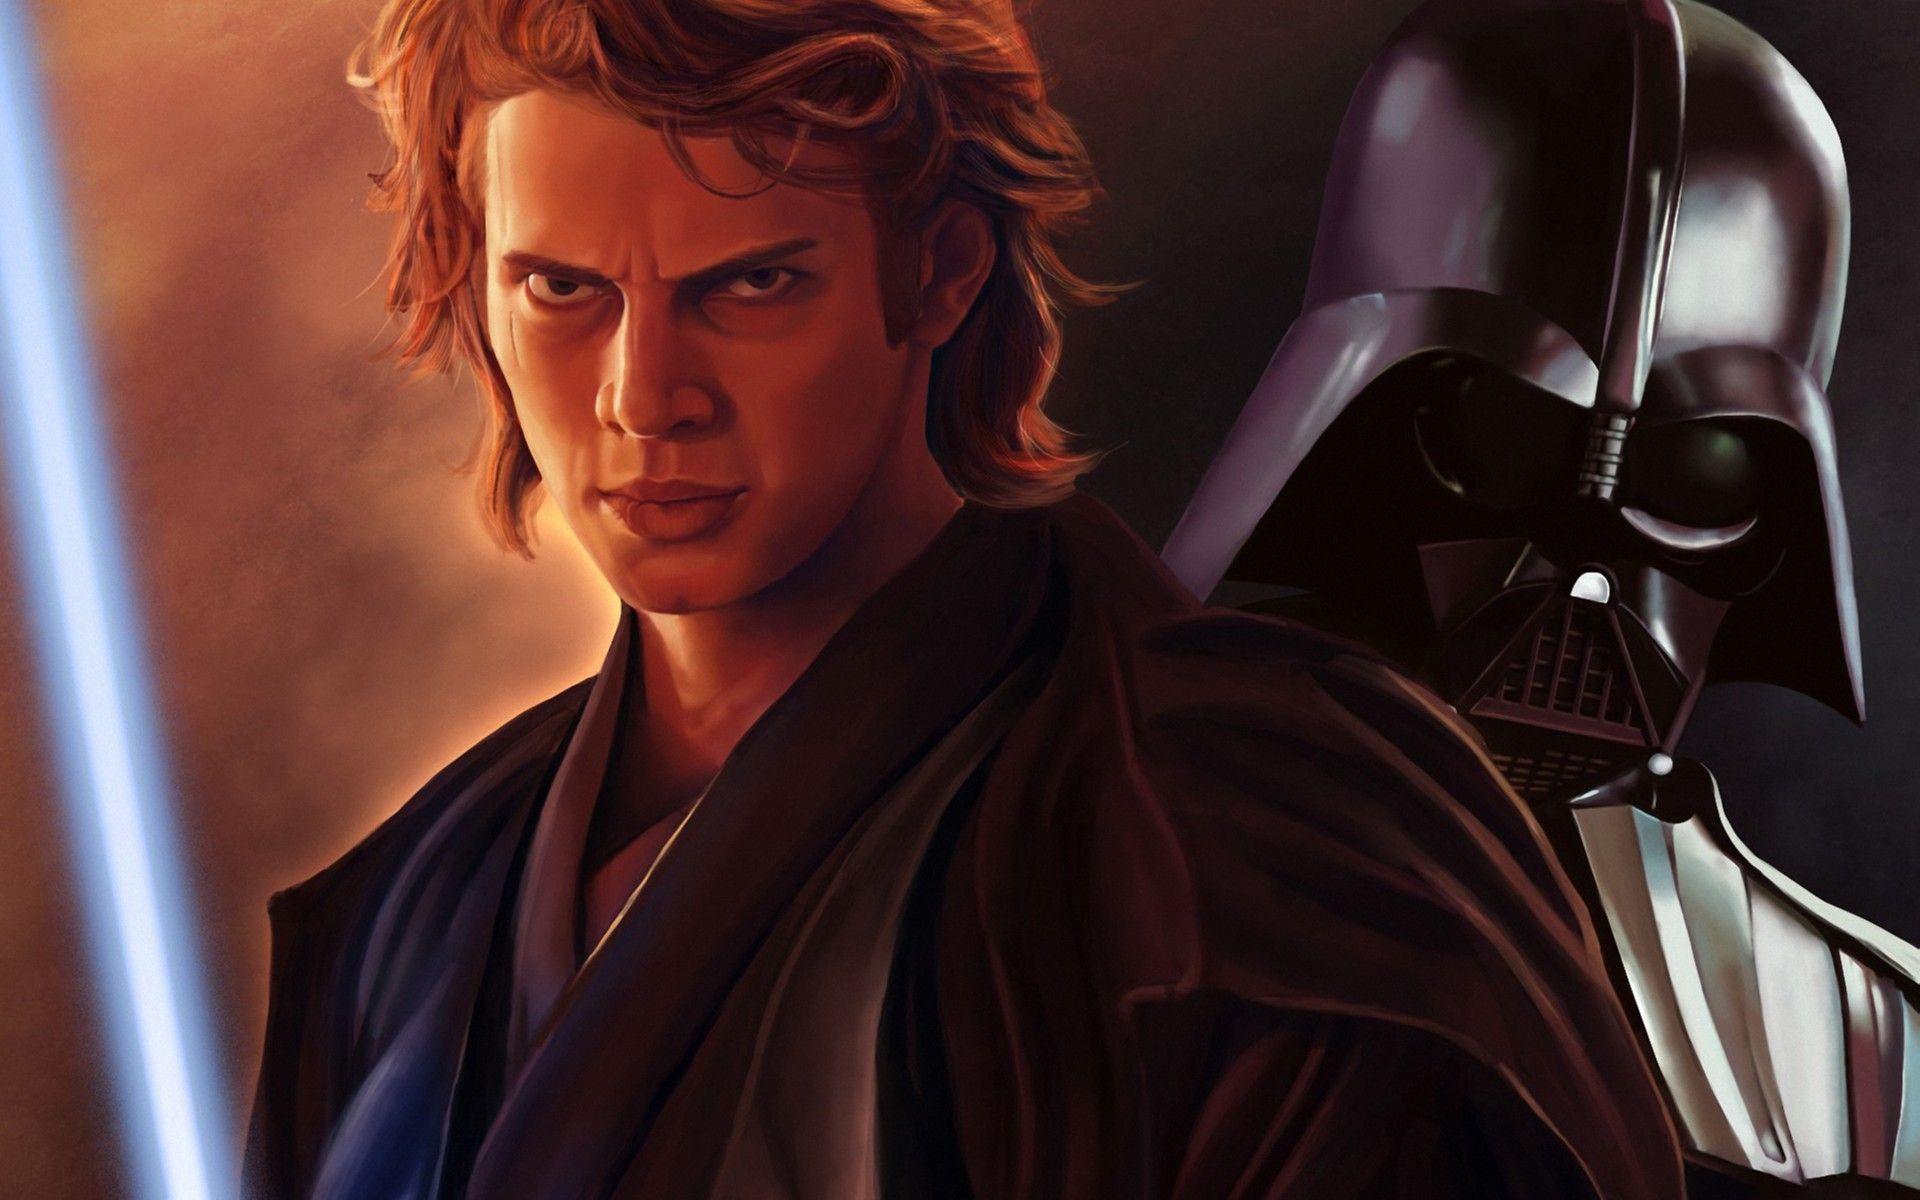 Anakin Skywalker Wallpaper for Desktop 1920x1200